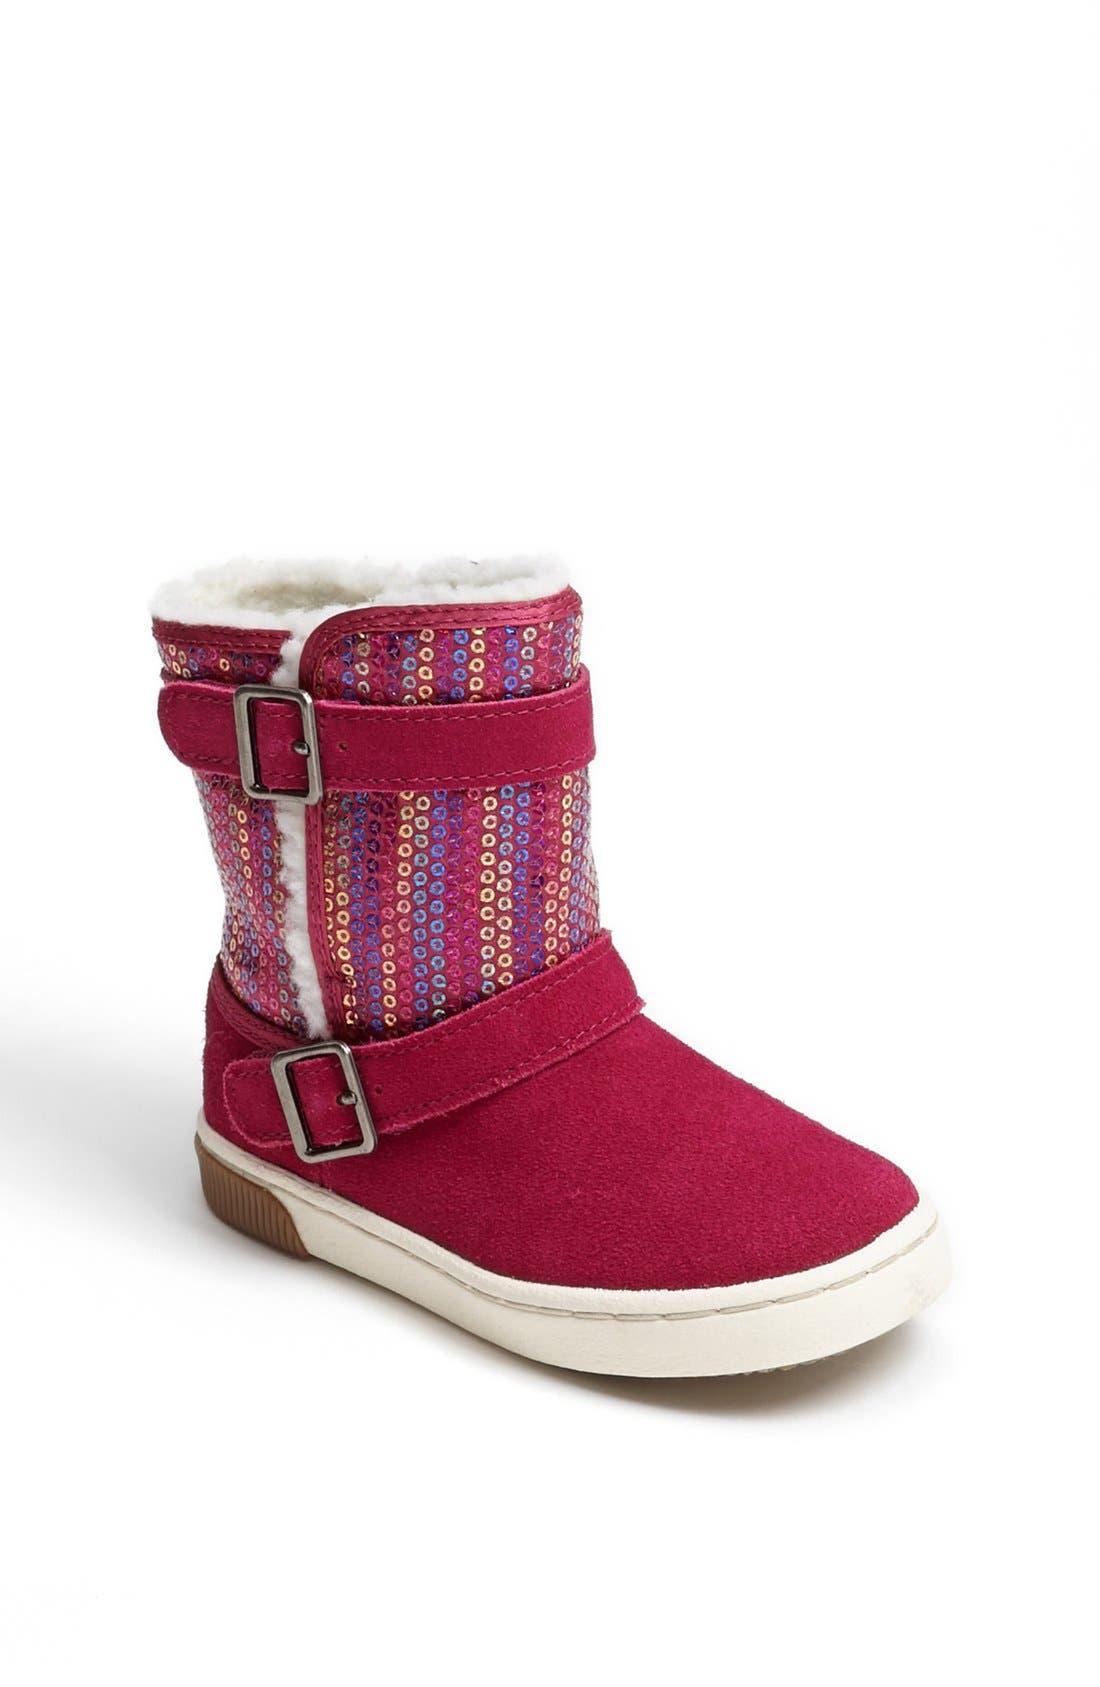 Alternate Image 1 Selected - Stride Rite 'Safi' Boot (Baby, Walker & Toddler)